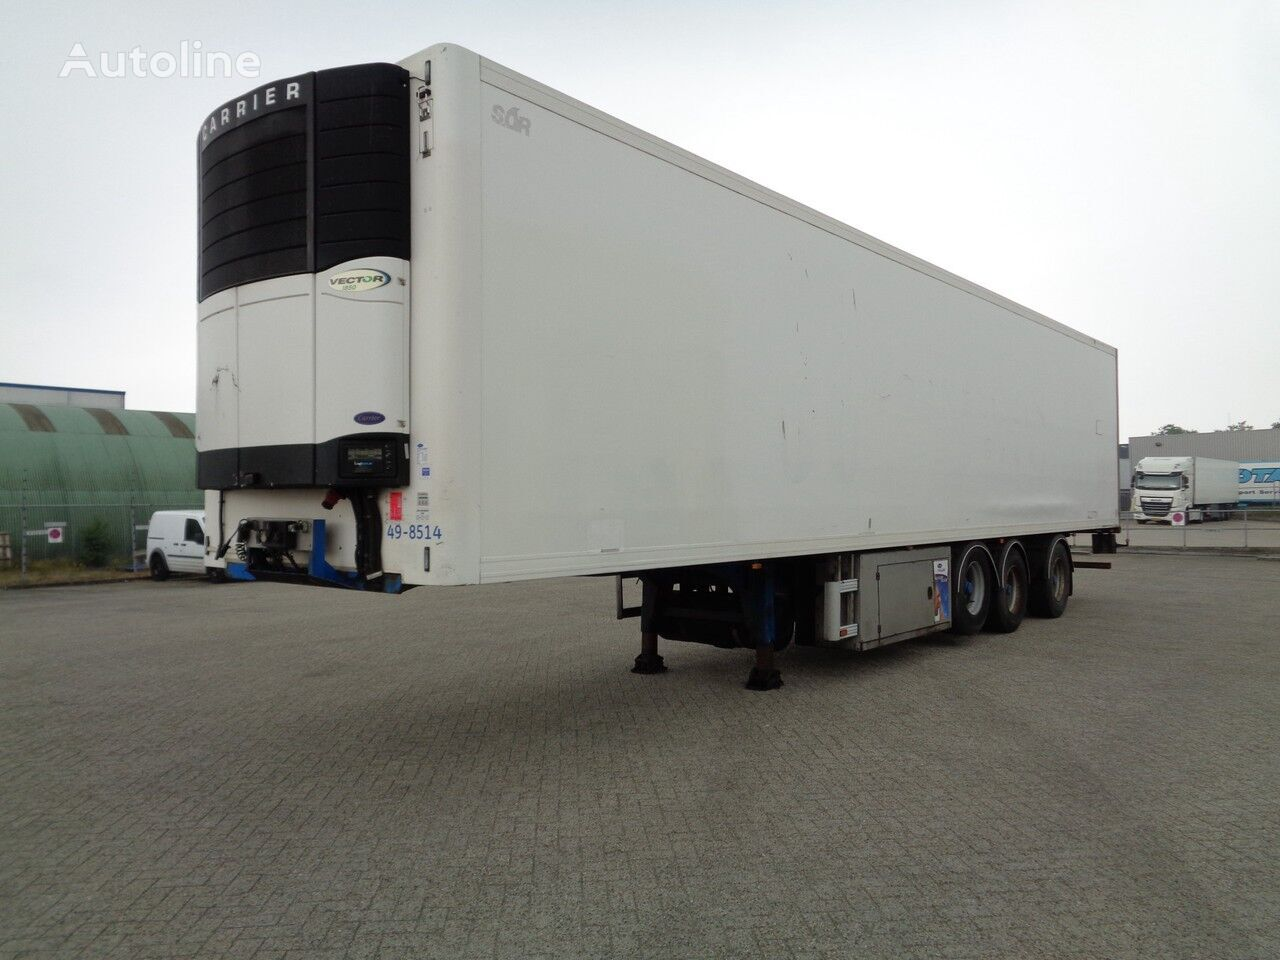 SOR SP71, 3 Achsen, BPW, Carrier Vector 1850, NL Trailer, TOP!! refrigerated semi-trailer